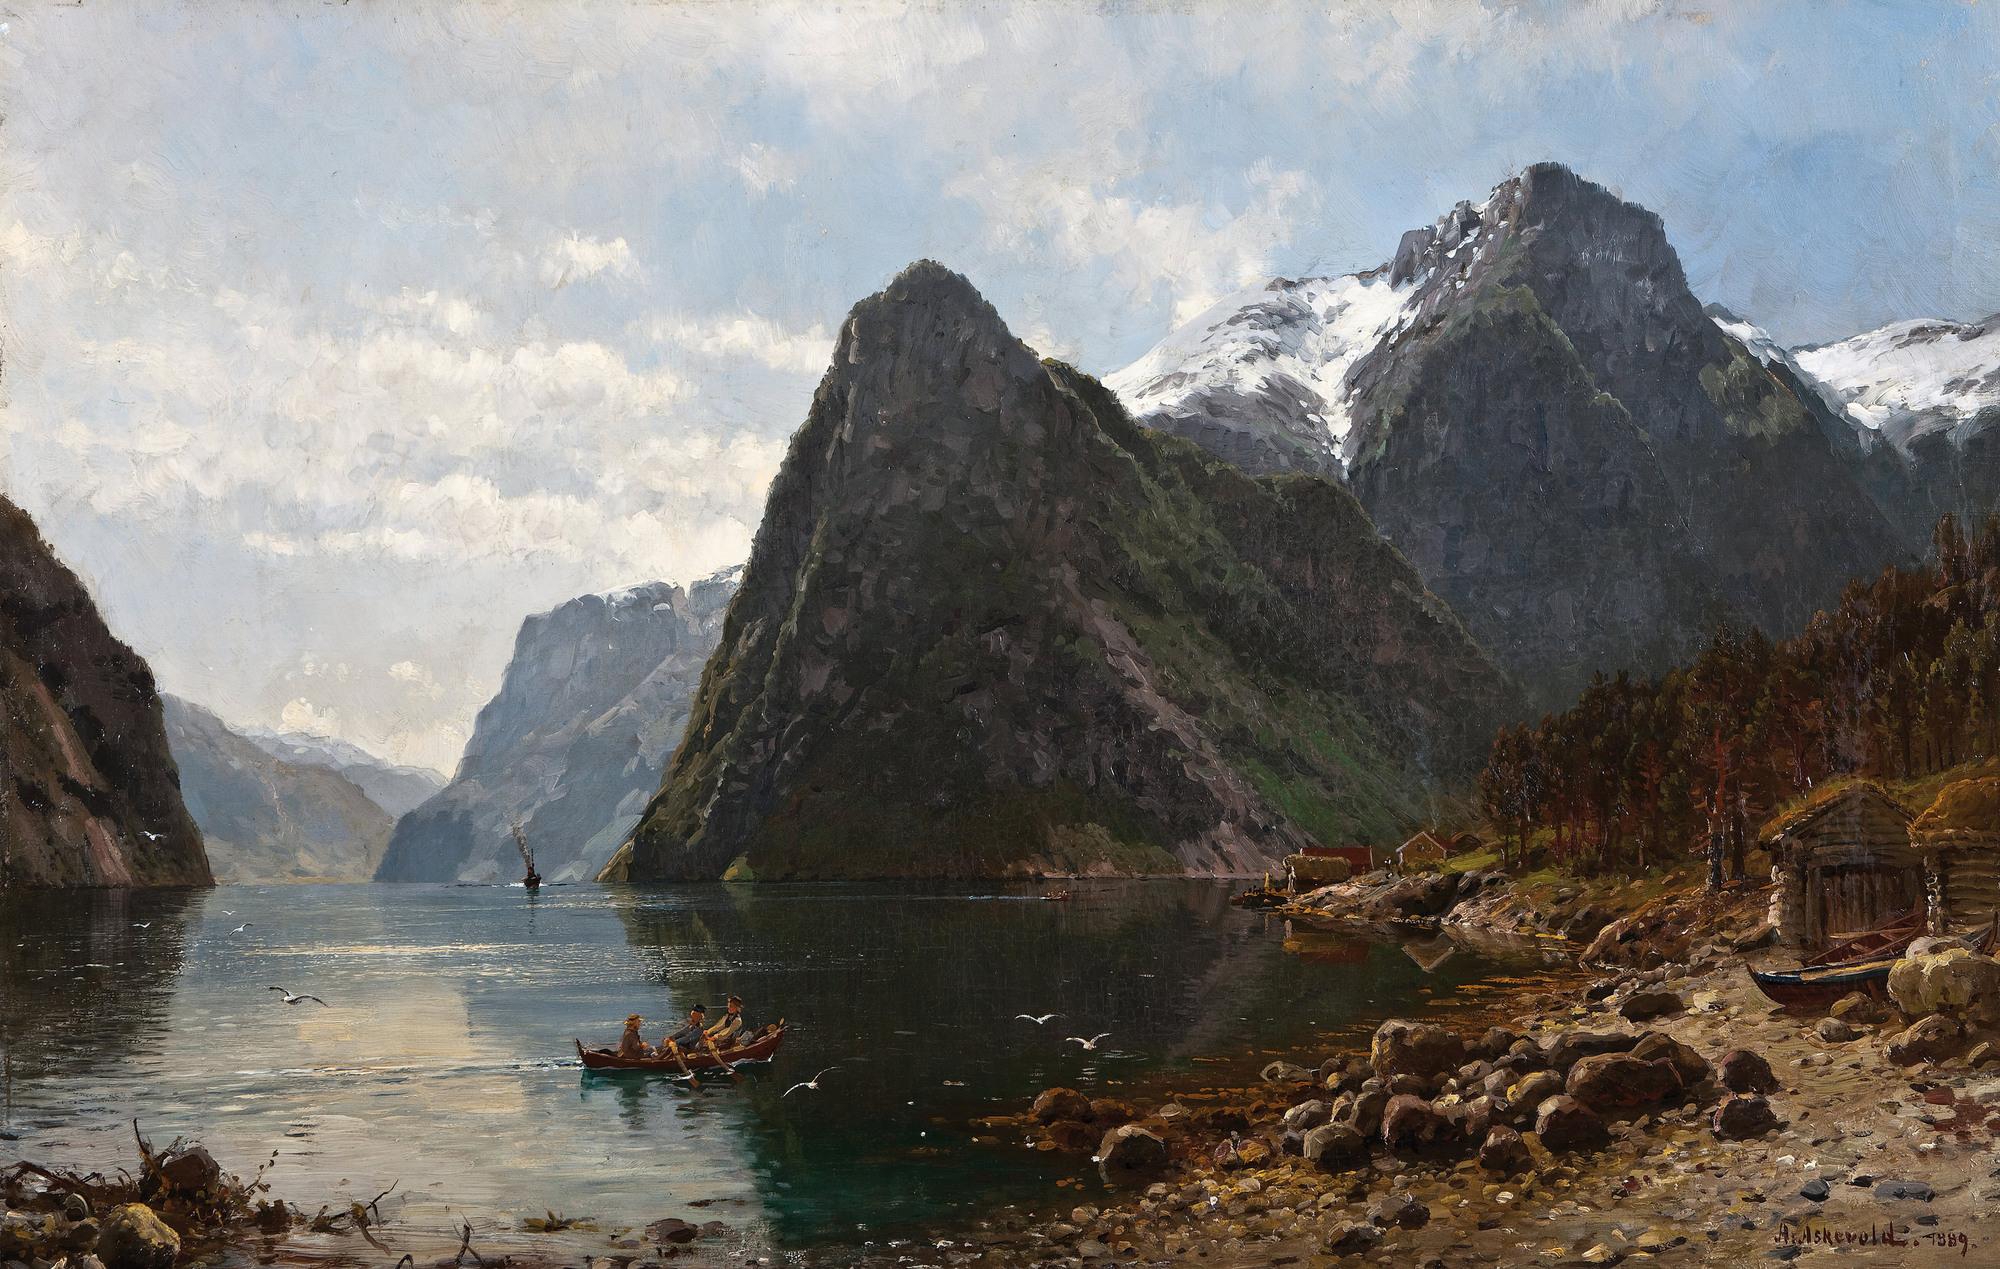 Андерс Аскевольд картина Fjord Landscape with People 1889 морской пейзаж холст масло